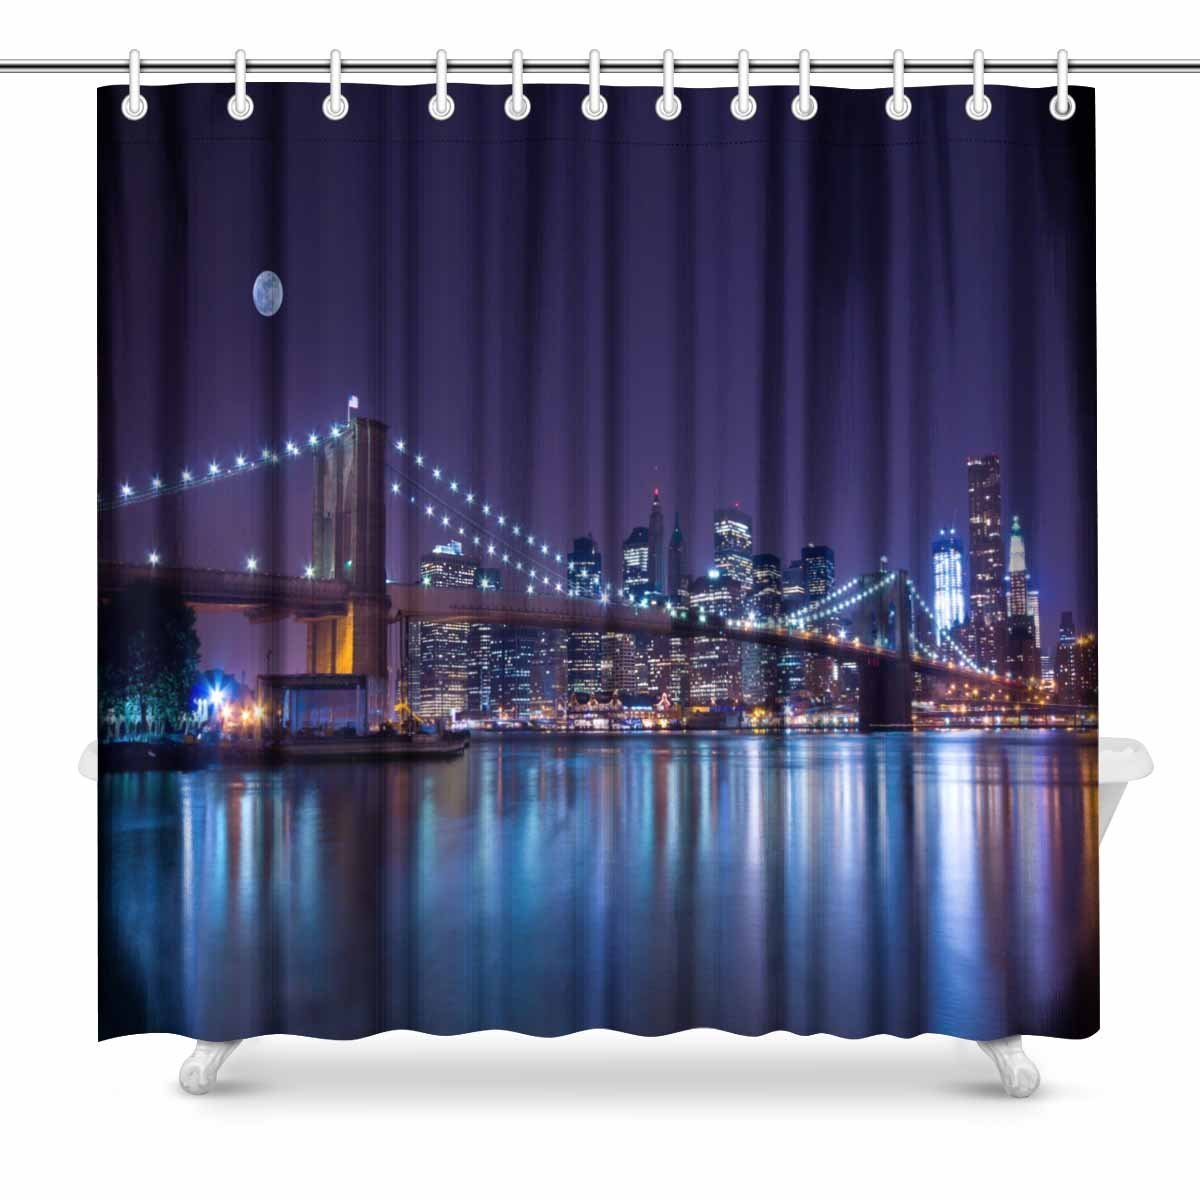 New York Brooklyn Bridge 3D Blockout Photo Printing Curtains Draps Fabric Window